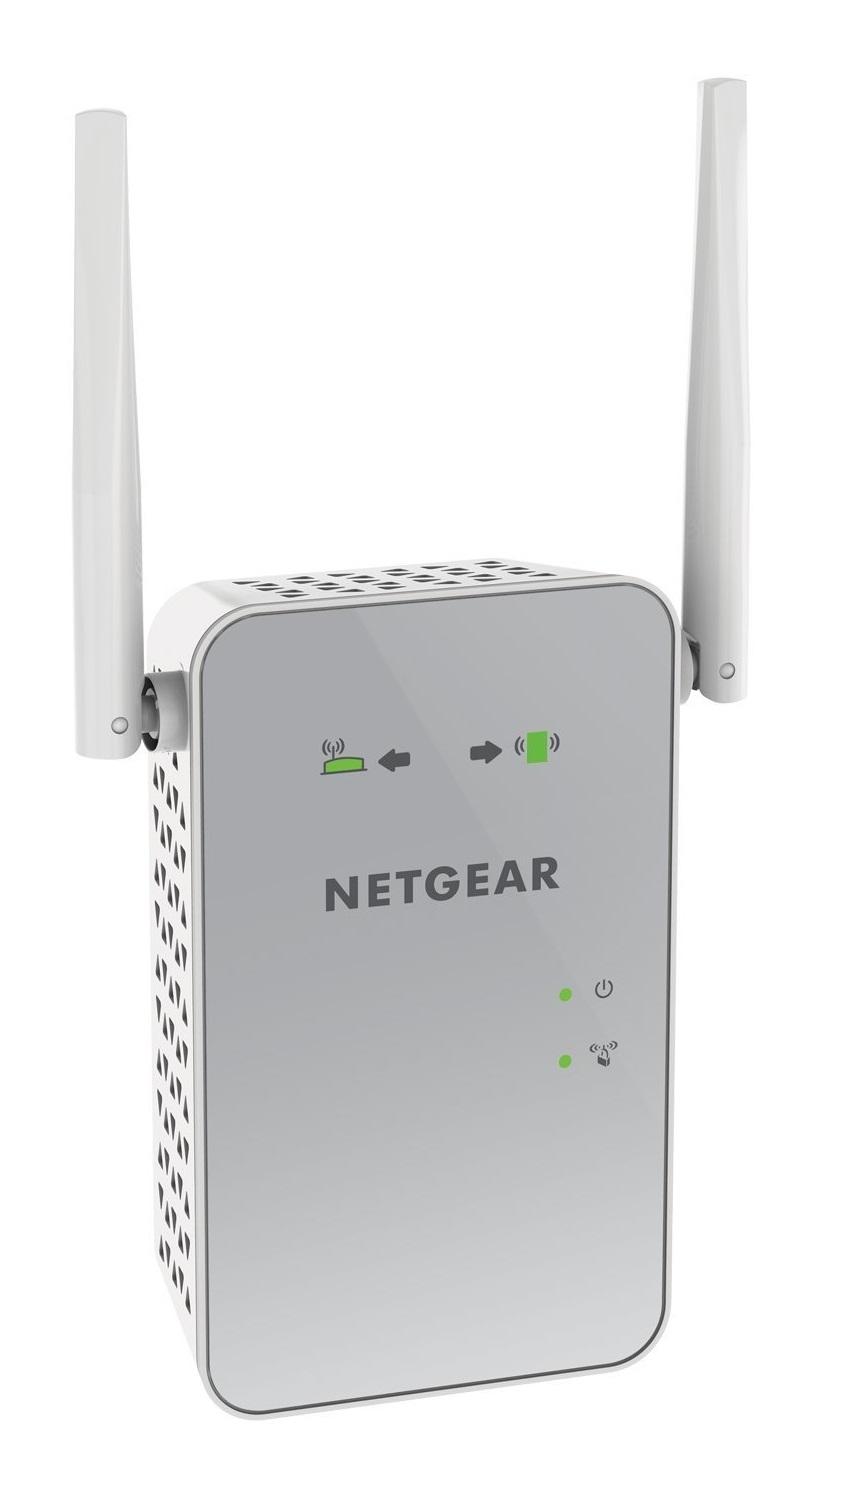 Netgear 1PT AC1200 WIFI RANGE EXTENDER